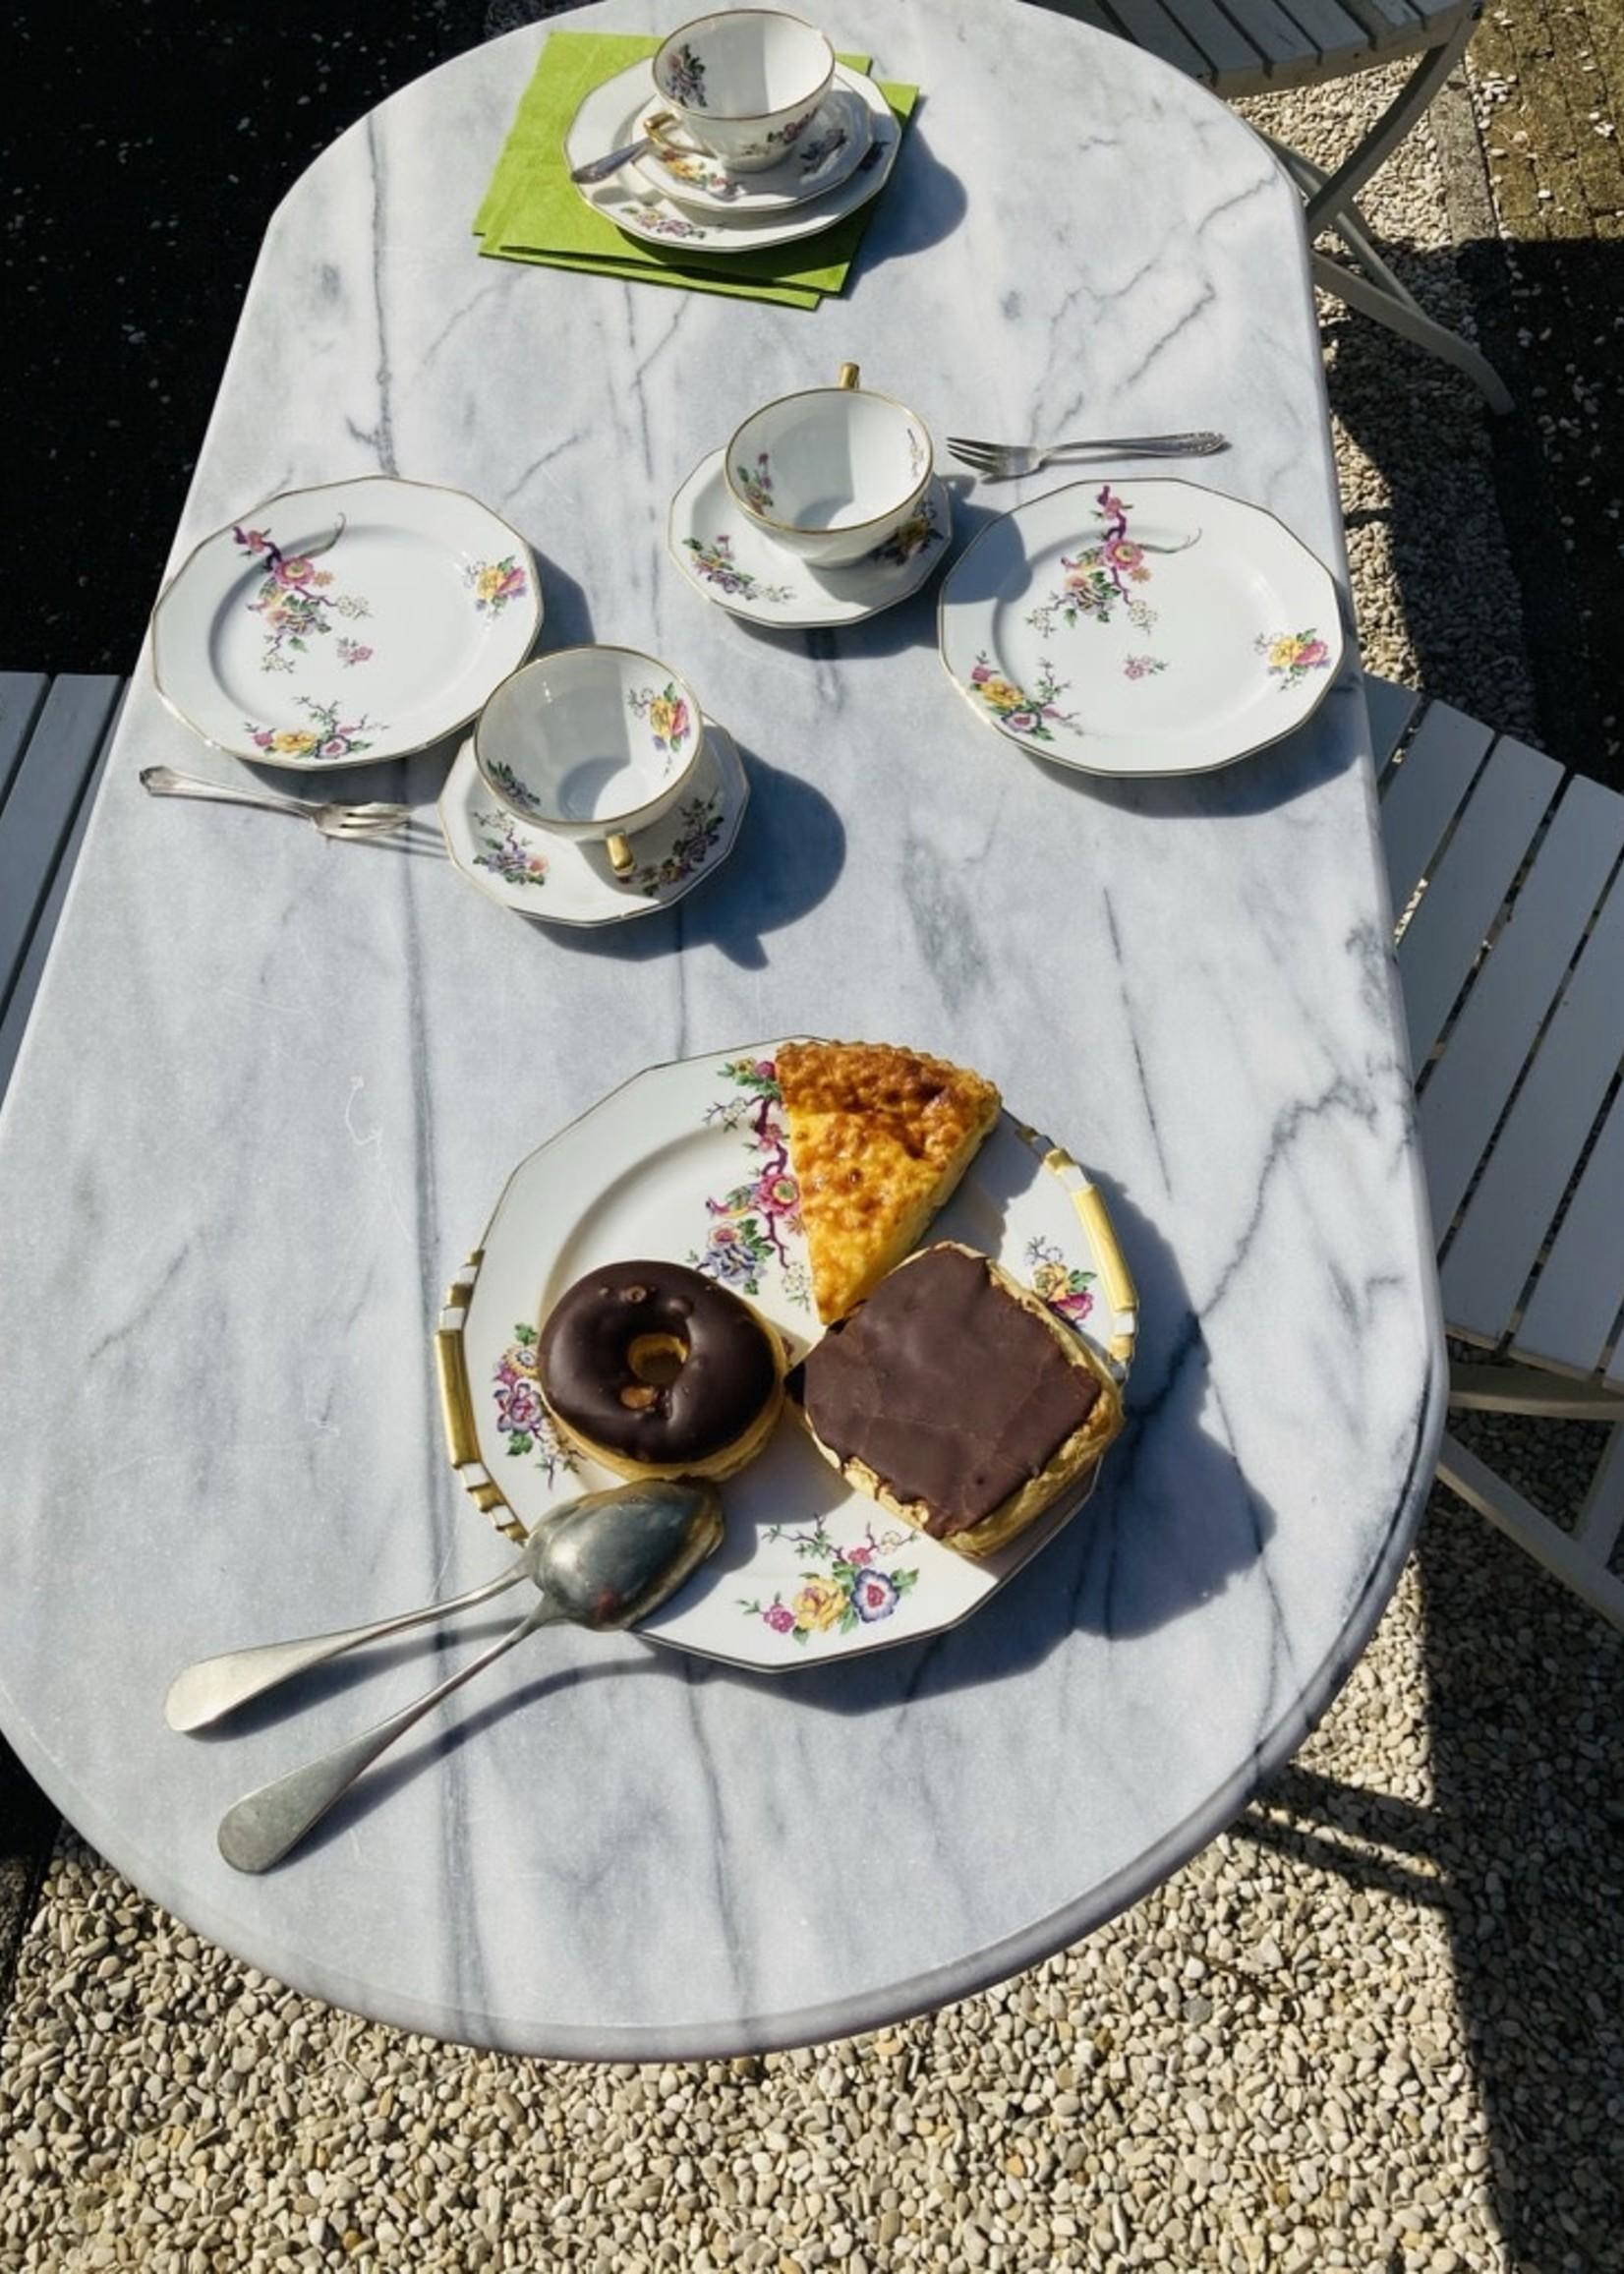 Dish from Cerabel Gand